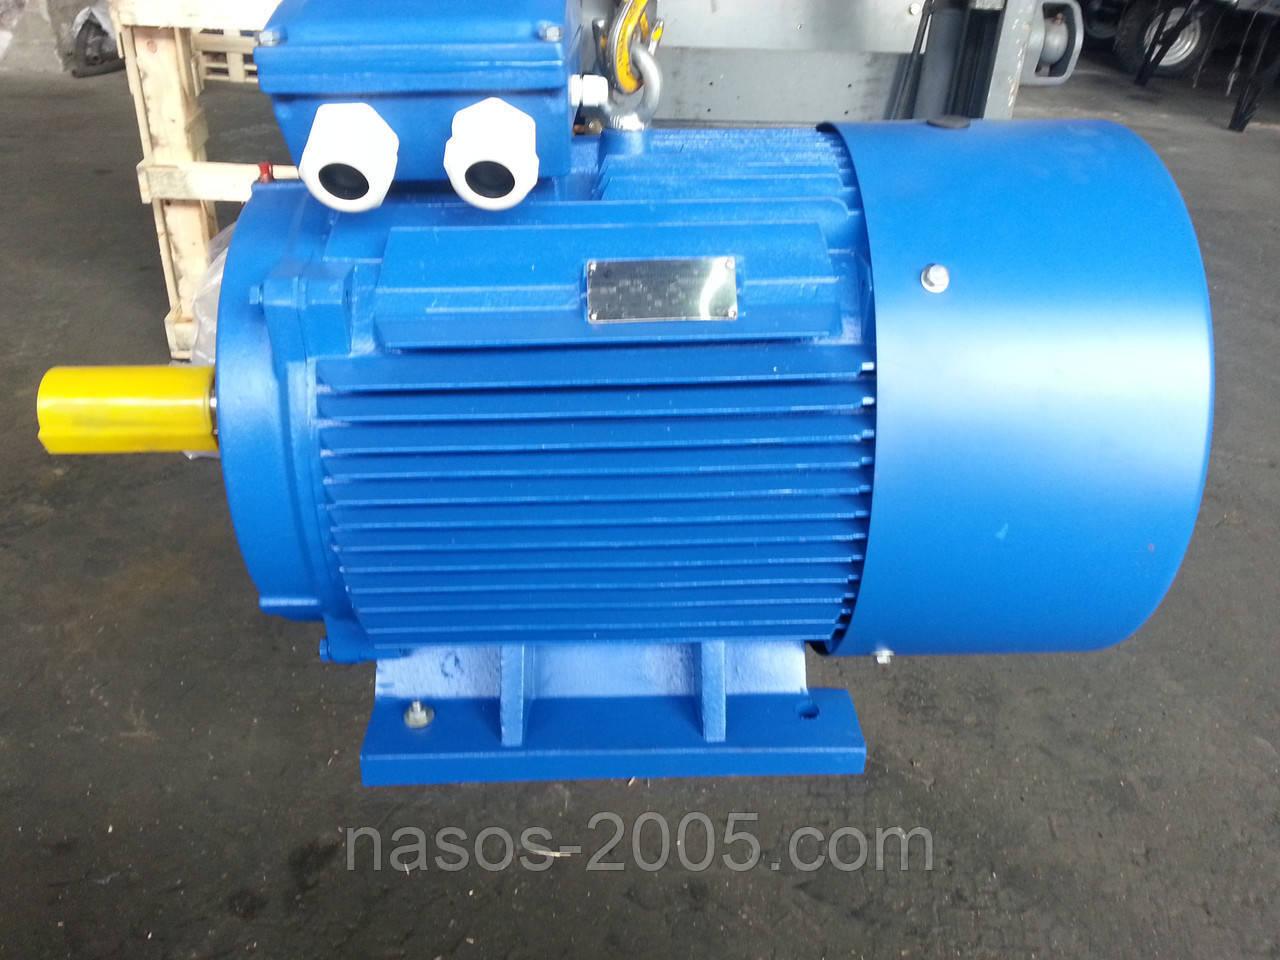 Електродвигун АИР 90 LB8 1,1 кВт, 750 об/хв